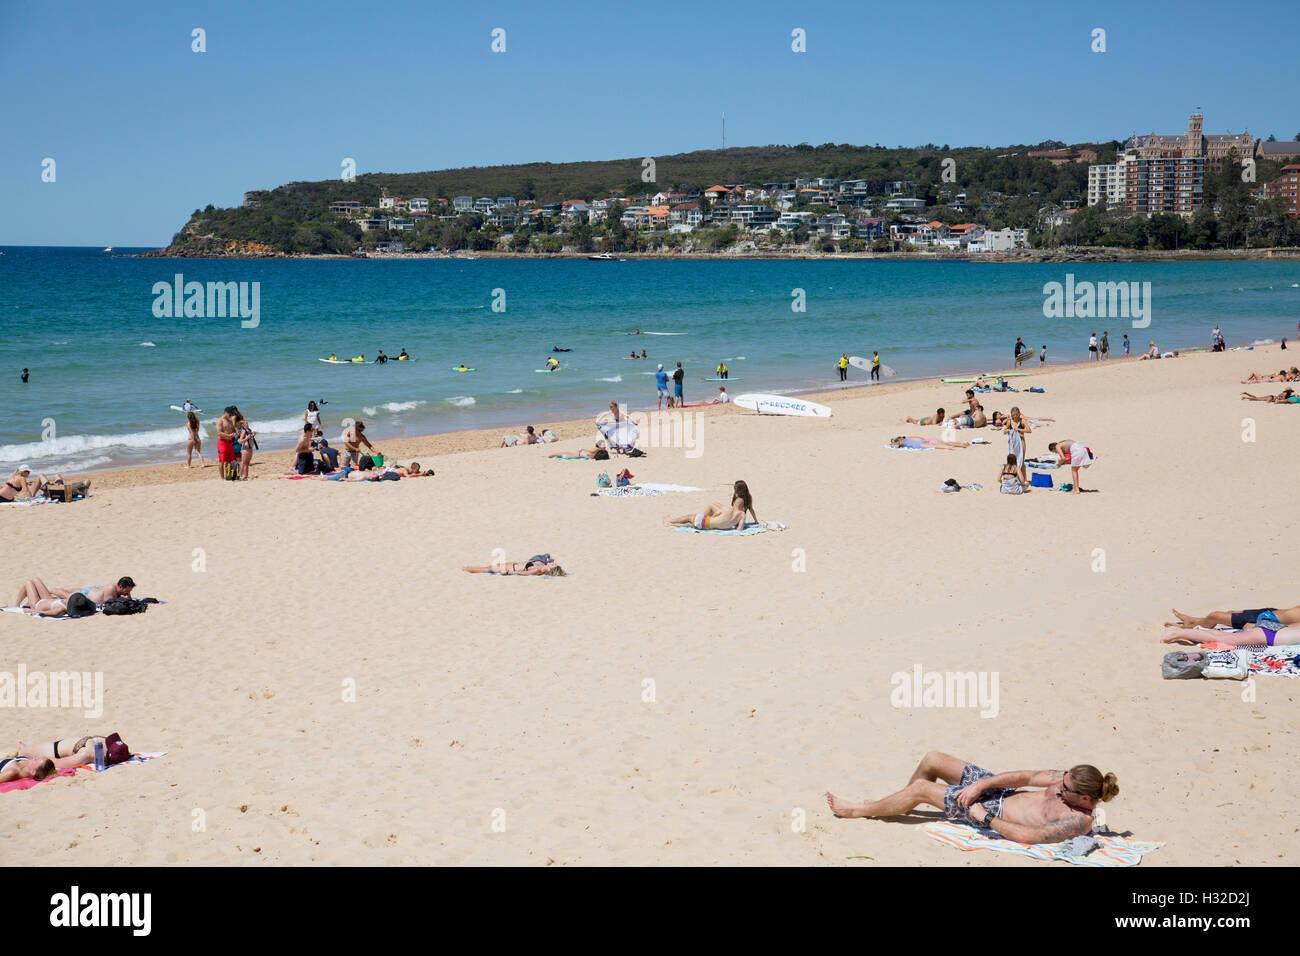 Australians sunbathing on Manly Beach, one of sydney's famous northern beaches,Australia - Stock Image